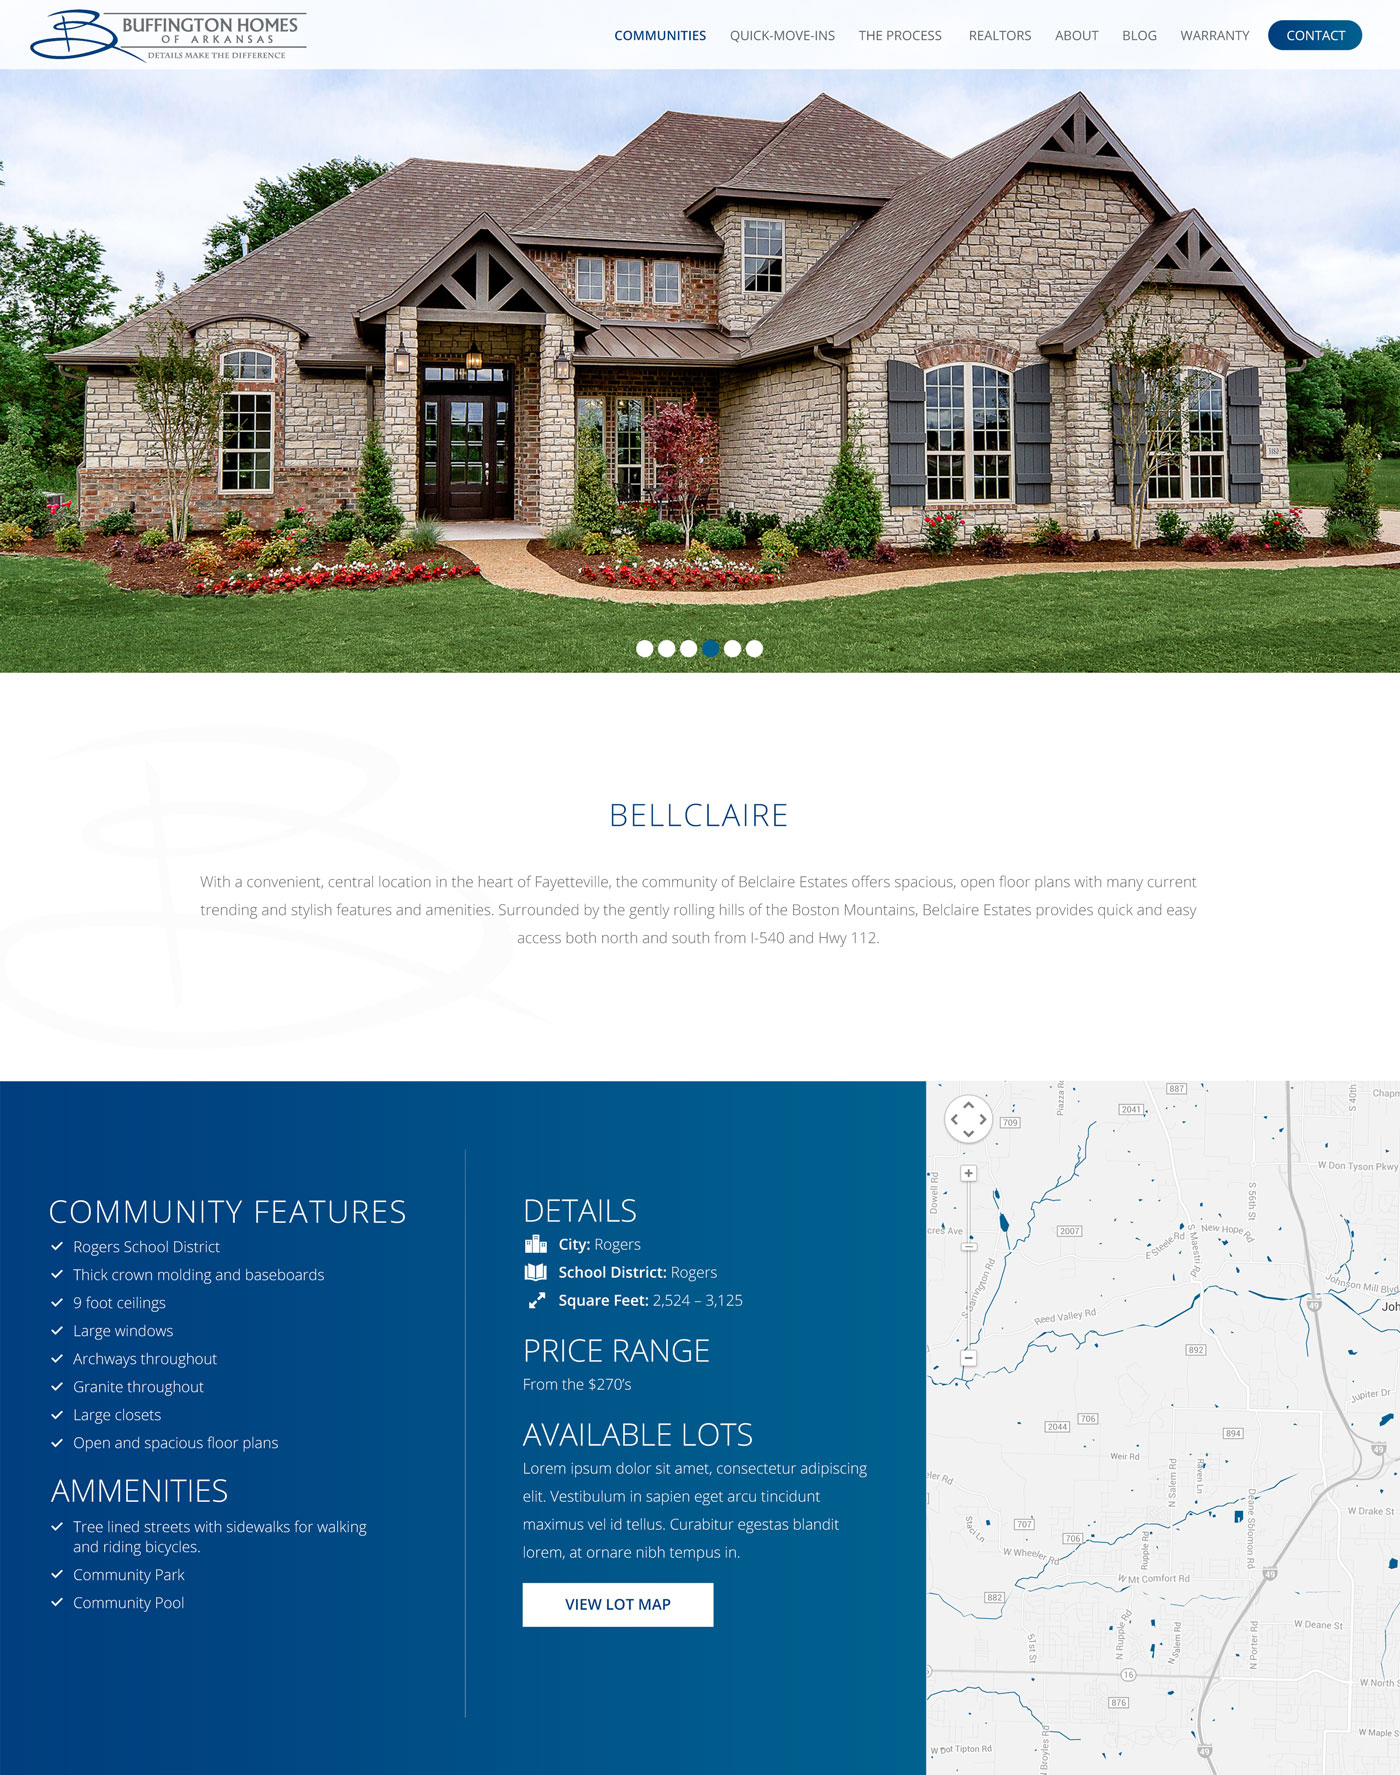 buffington homes of arkansas website community desktop example screen